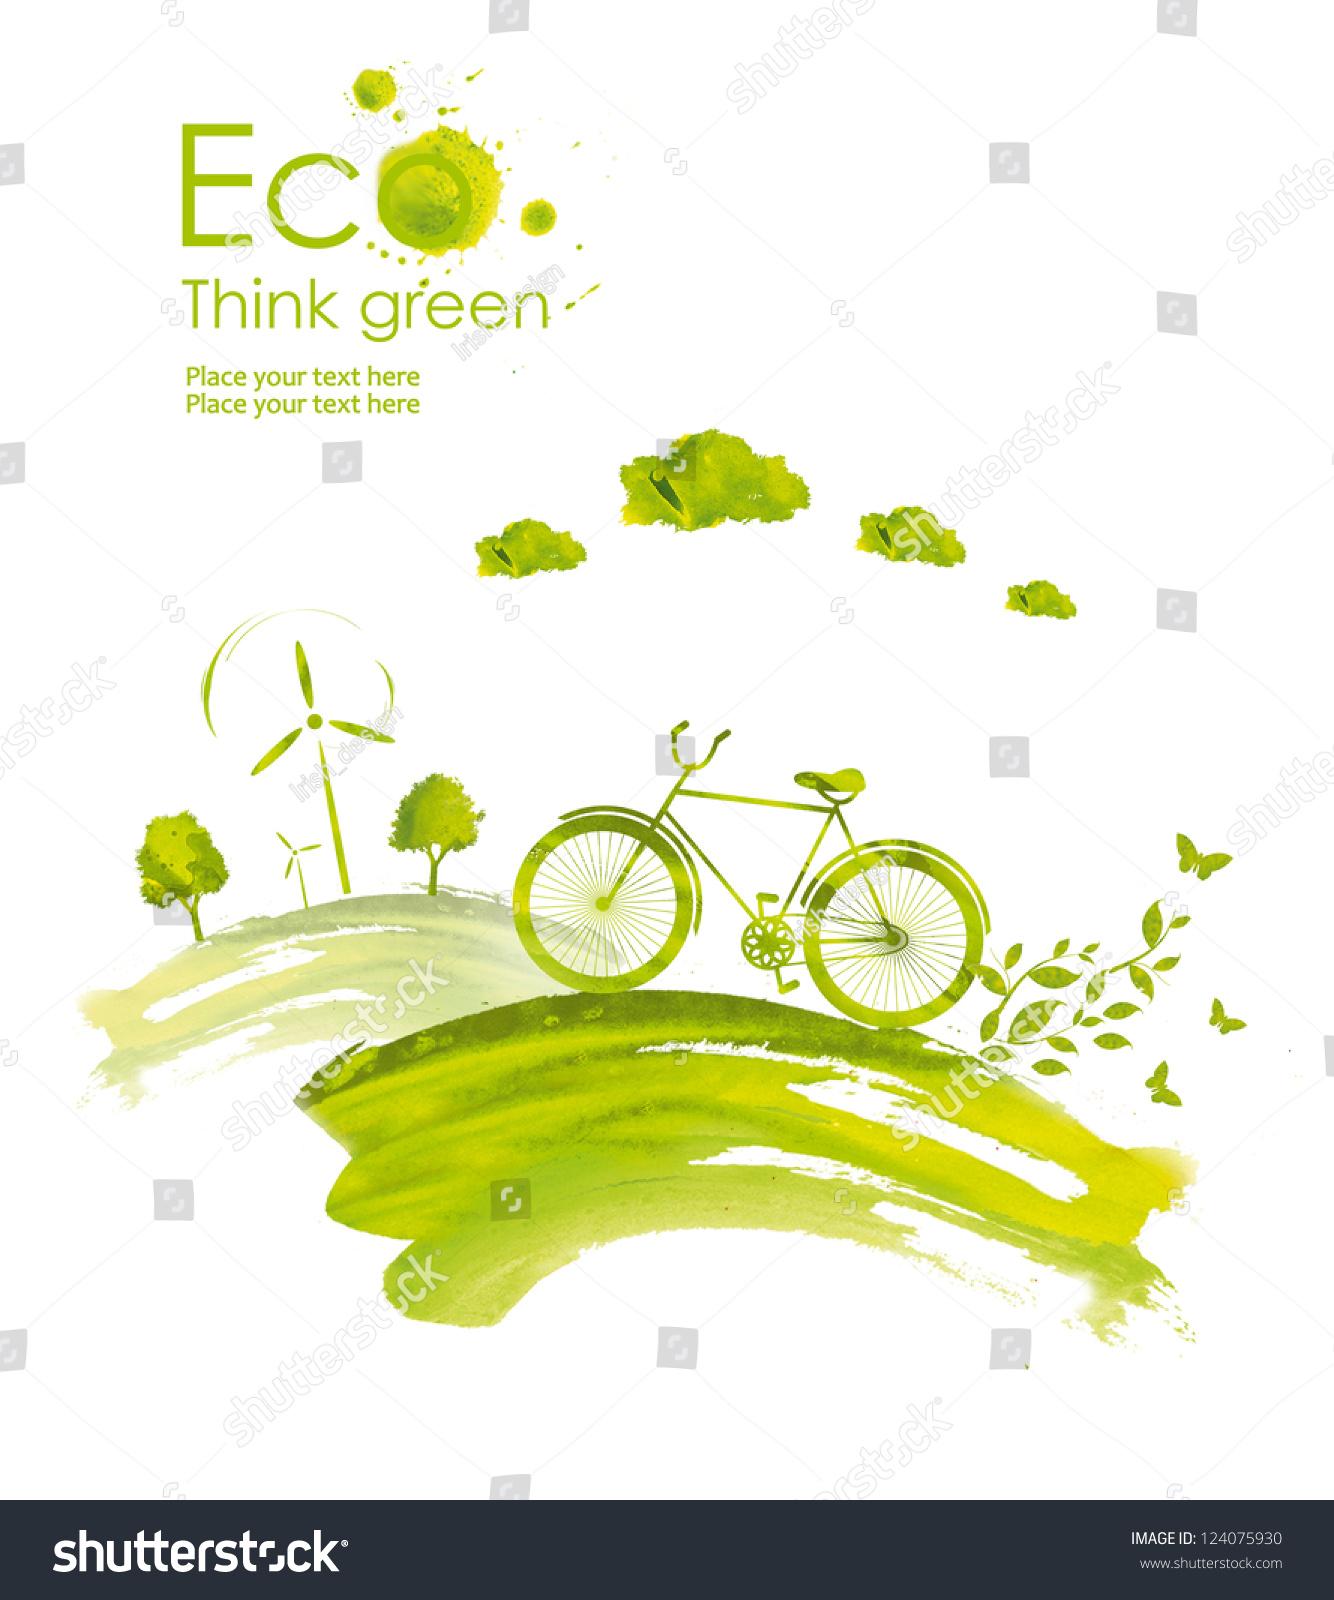 Environmental Concept Earthfriendly Landscapes: Illustration Environmentally Friendly Planet Landscape